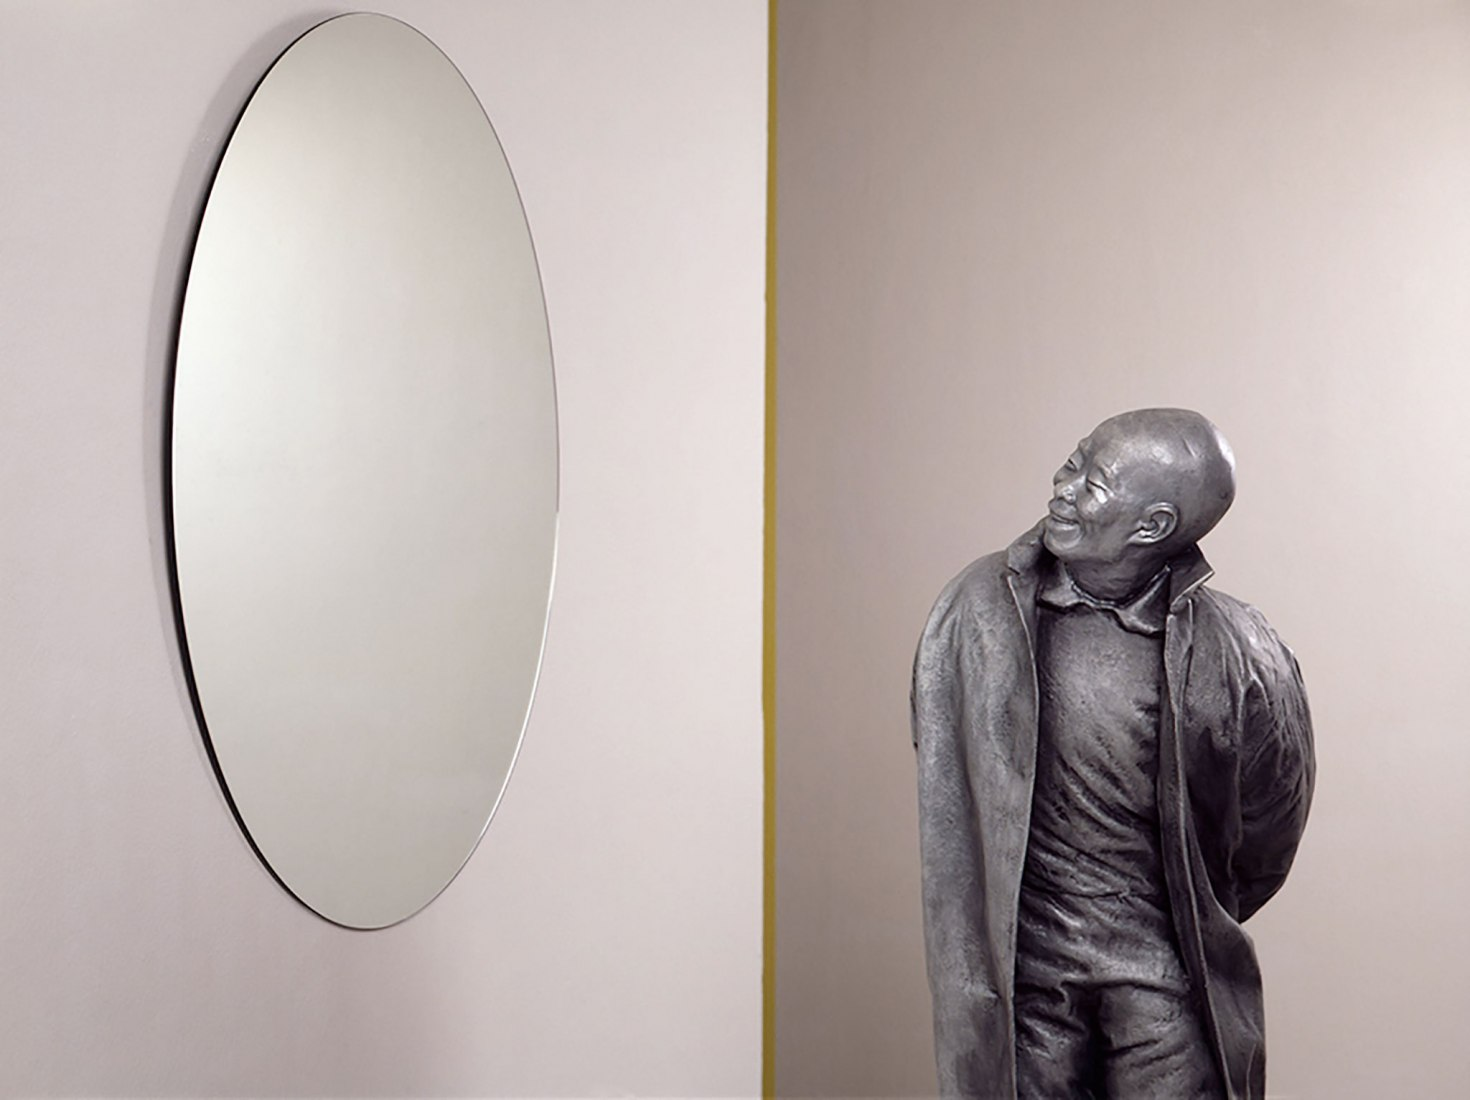 Juan Muñoz. Chino mirándose en espejo redondo, 1999. Figura: 142 x 48 x 43 cm | 56 x 19 x 17 in. Espejo: 90 cm | 35 ½ in diámetro. Espejo y resina de poliéster.